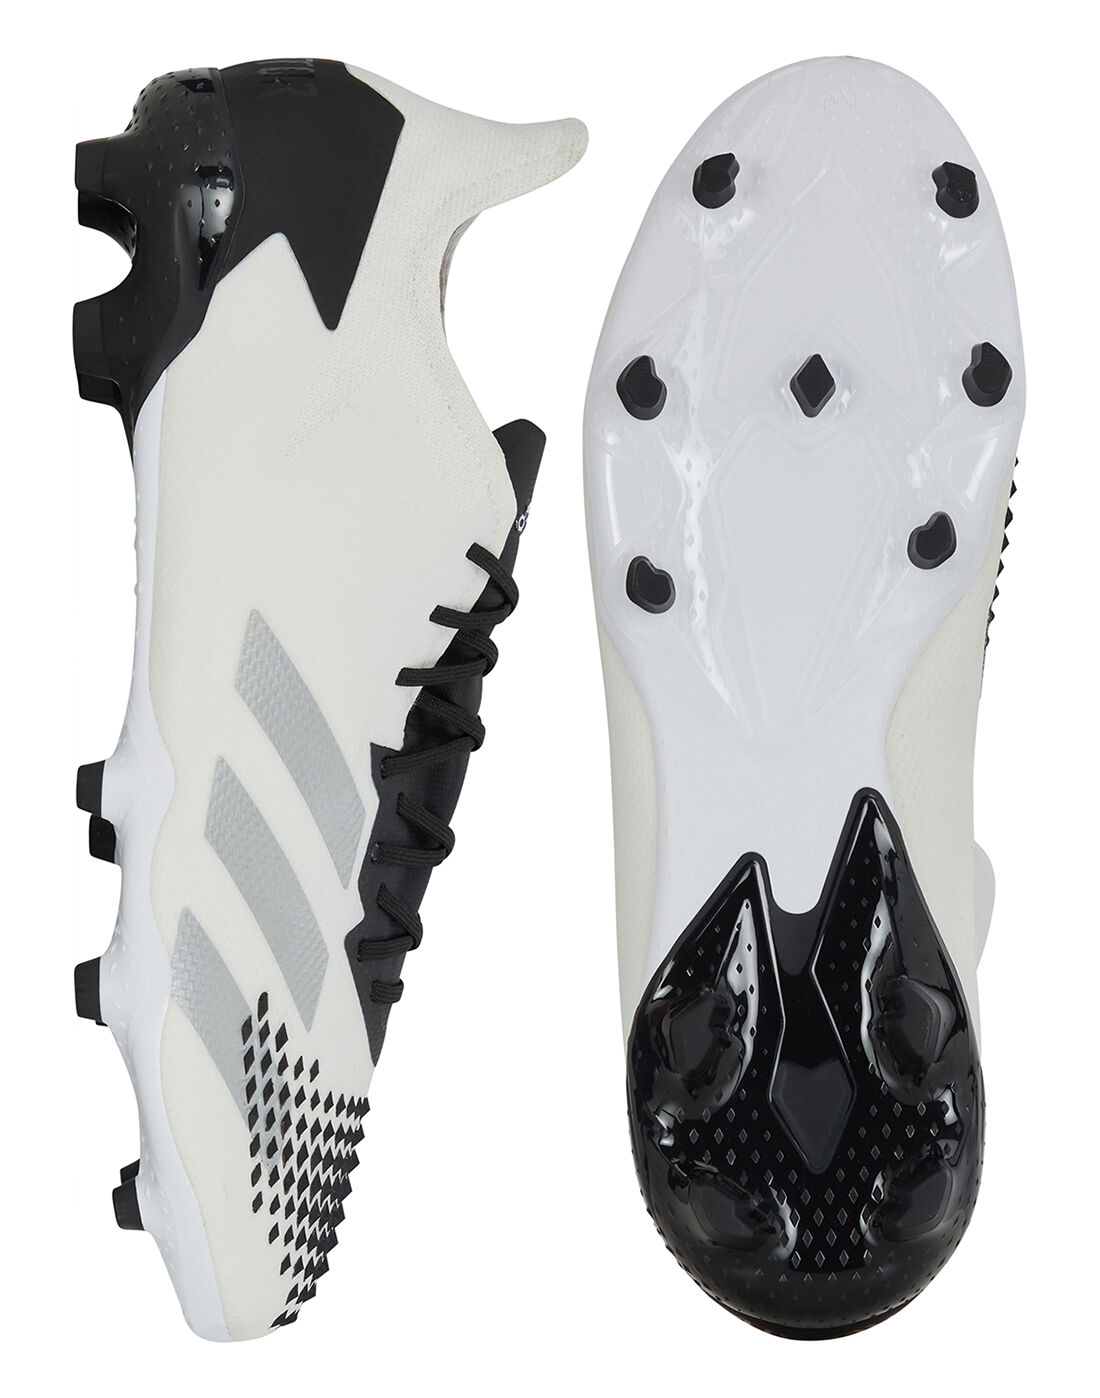 adidas adidas swimming briefs for women black pants ideas   Adults Predator 20.2 Firm Ground